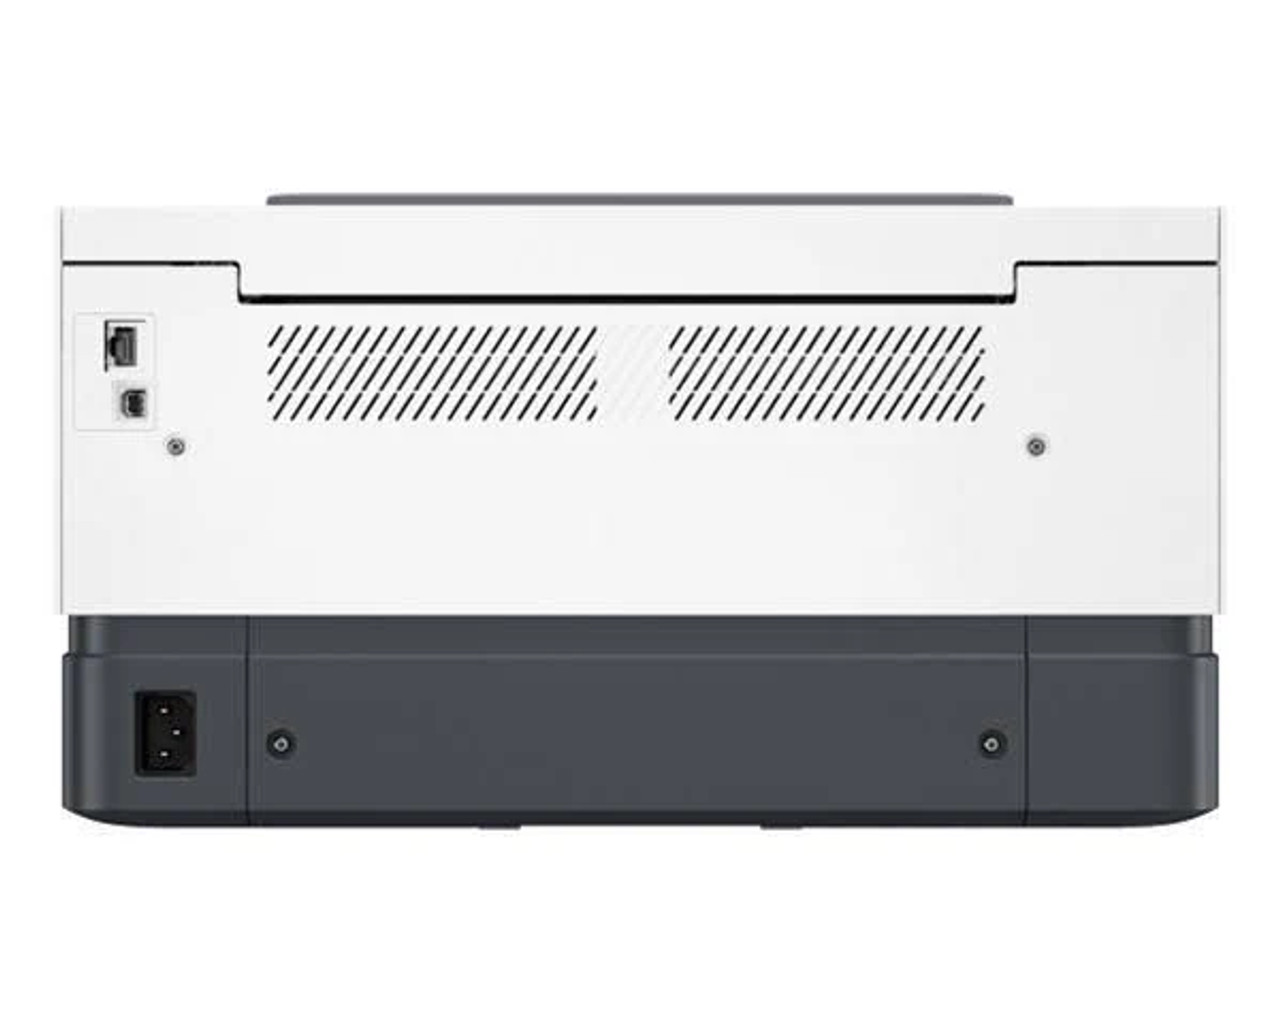 HP Neverstop Laser 1001nw Monochrome Printer